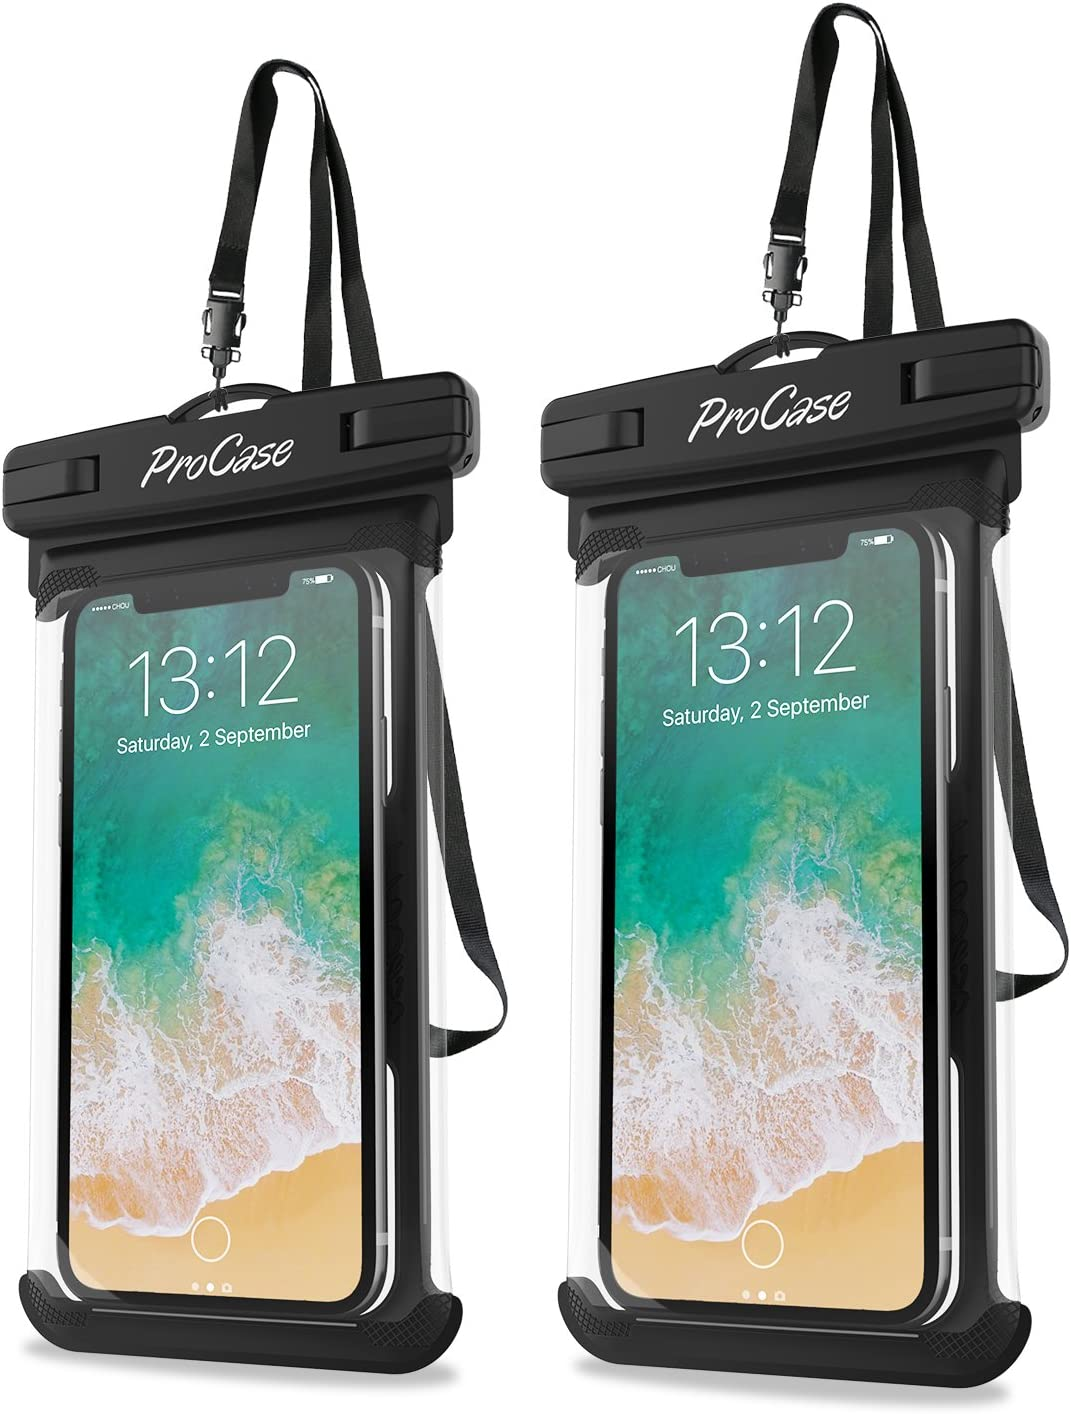 ProCase Bolsa Estanca Universal para iPhone SE 2020/iPhone 11 Pro Max/XR/6S Plus, SE, Galaxy S20 Ultra/S10/J7, Huawei P20/P9/P8 Lite, Xiaomi A1/Redmi Note 5, hasta 6,9